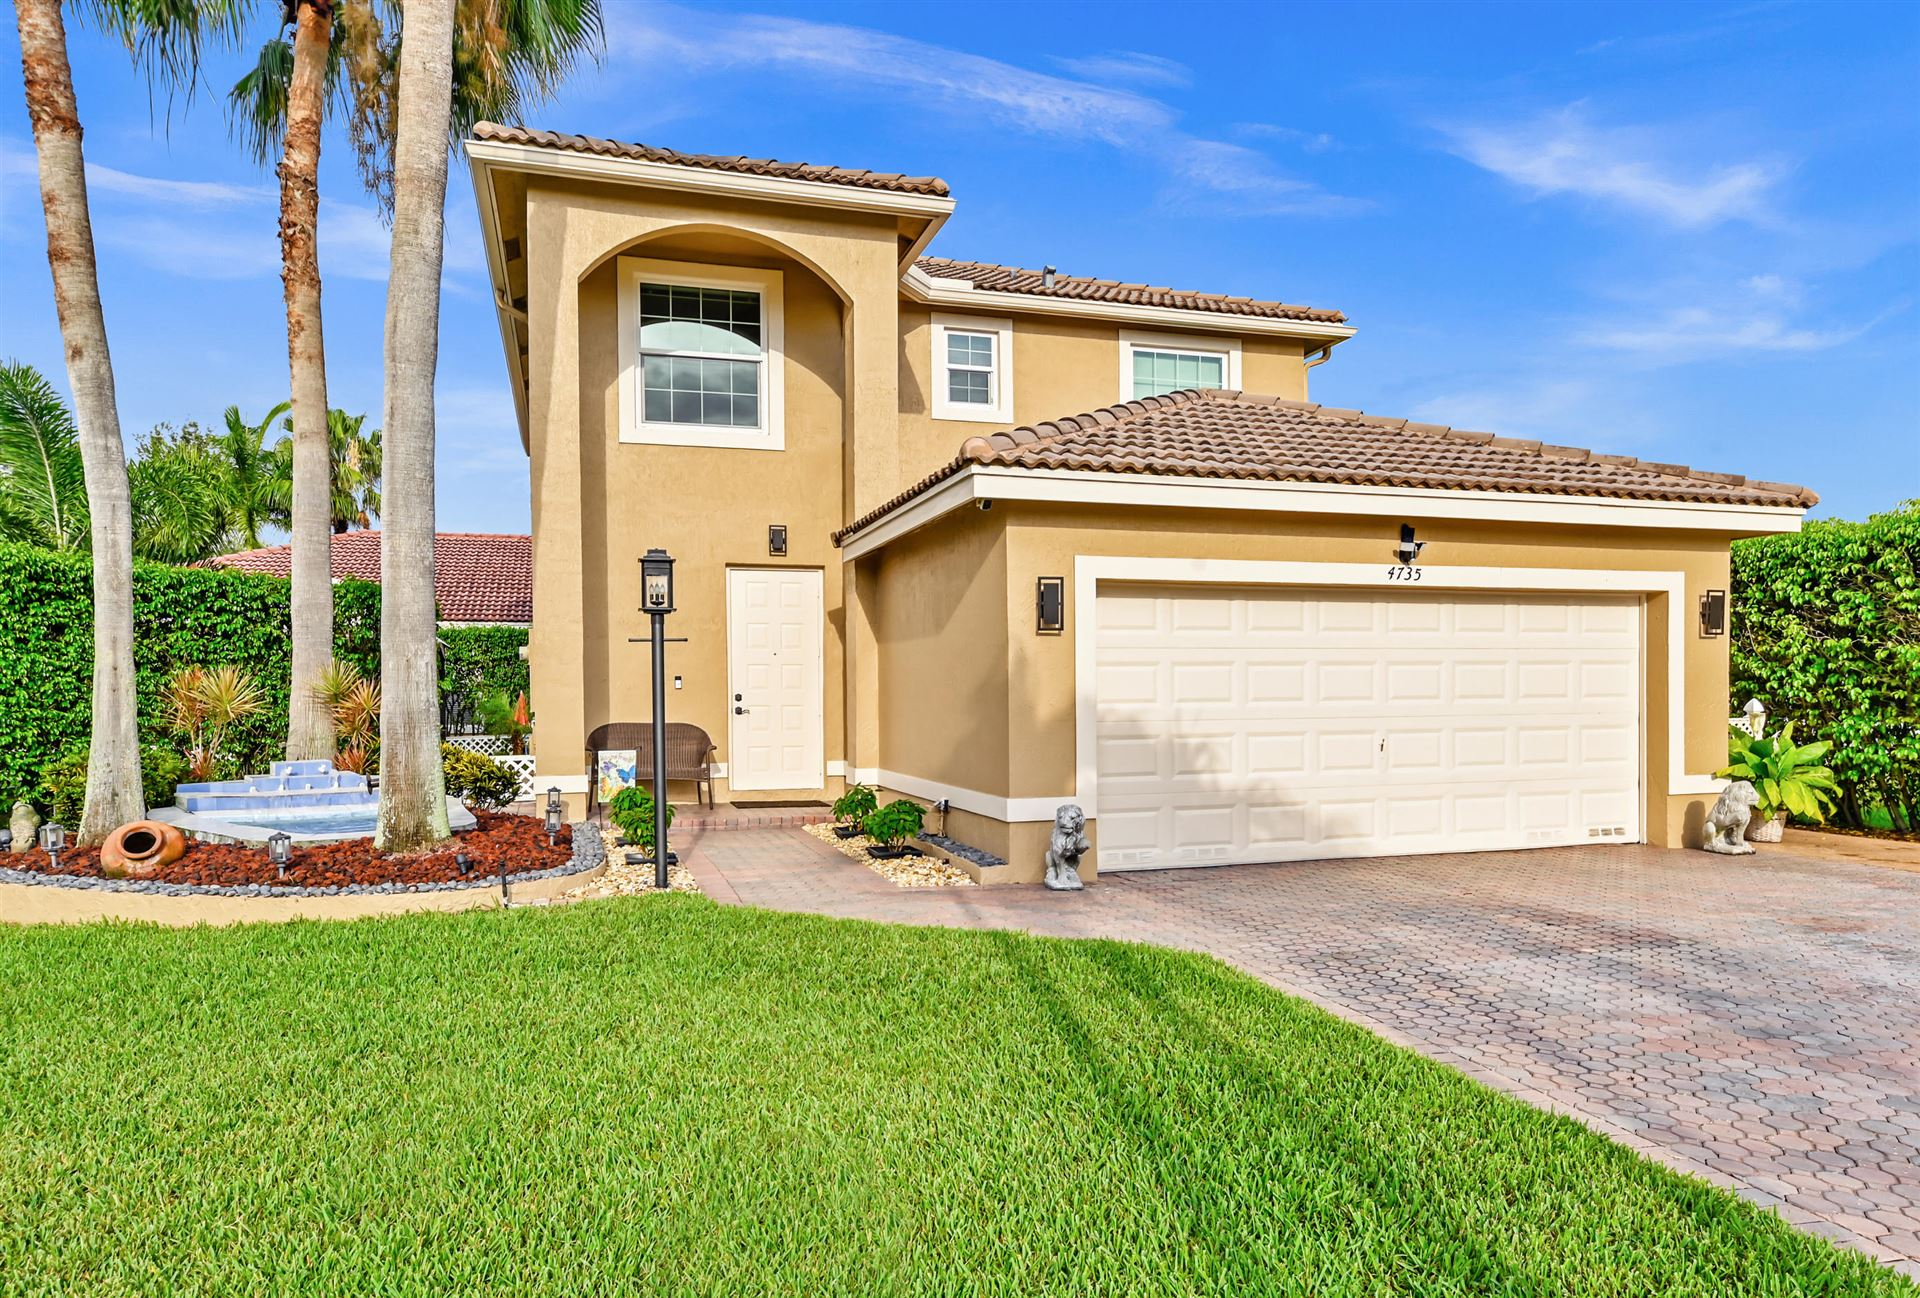 4735 NW 120th Way, Coral Springs, FL 33076 - MLS#: RX-10718280